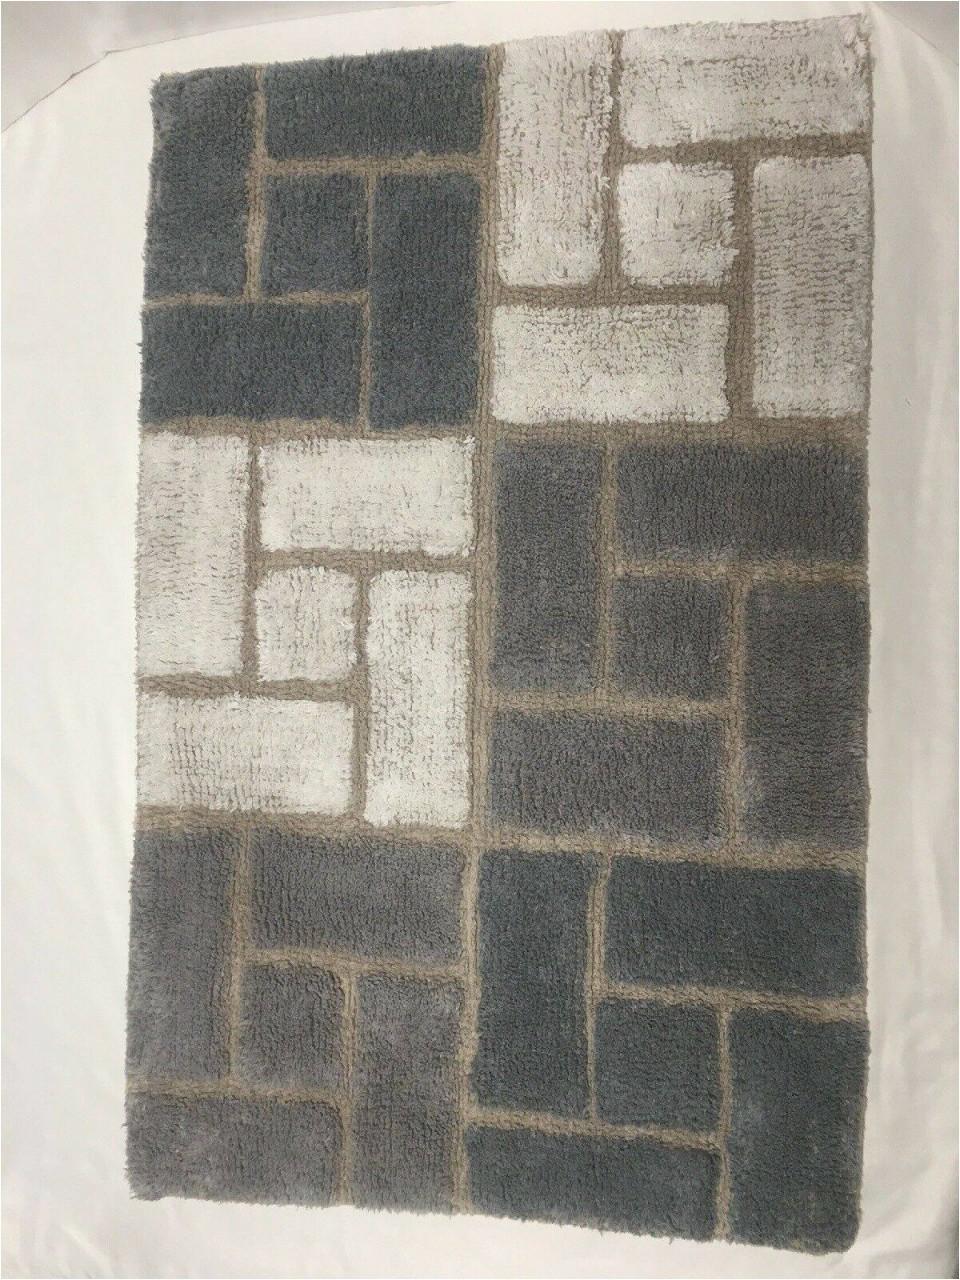 grey and white bathroom rugs blue grey bathroom rugs charcoal bath mats dark gray rug set from grey and white bathroom rugs